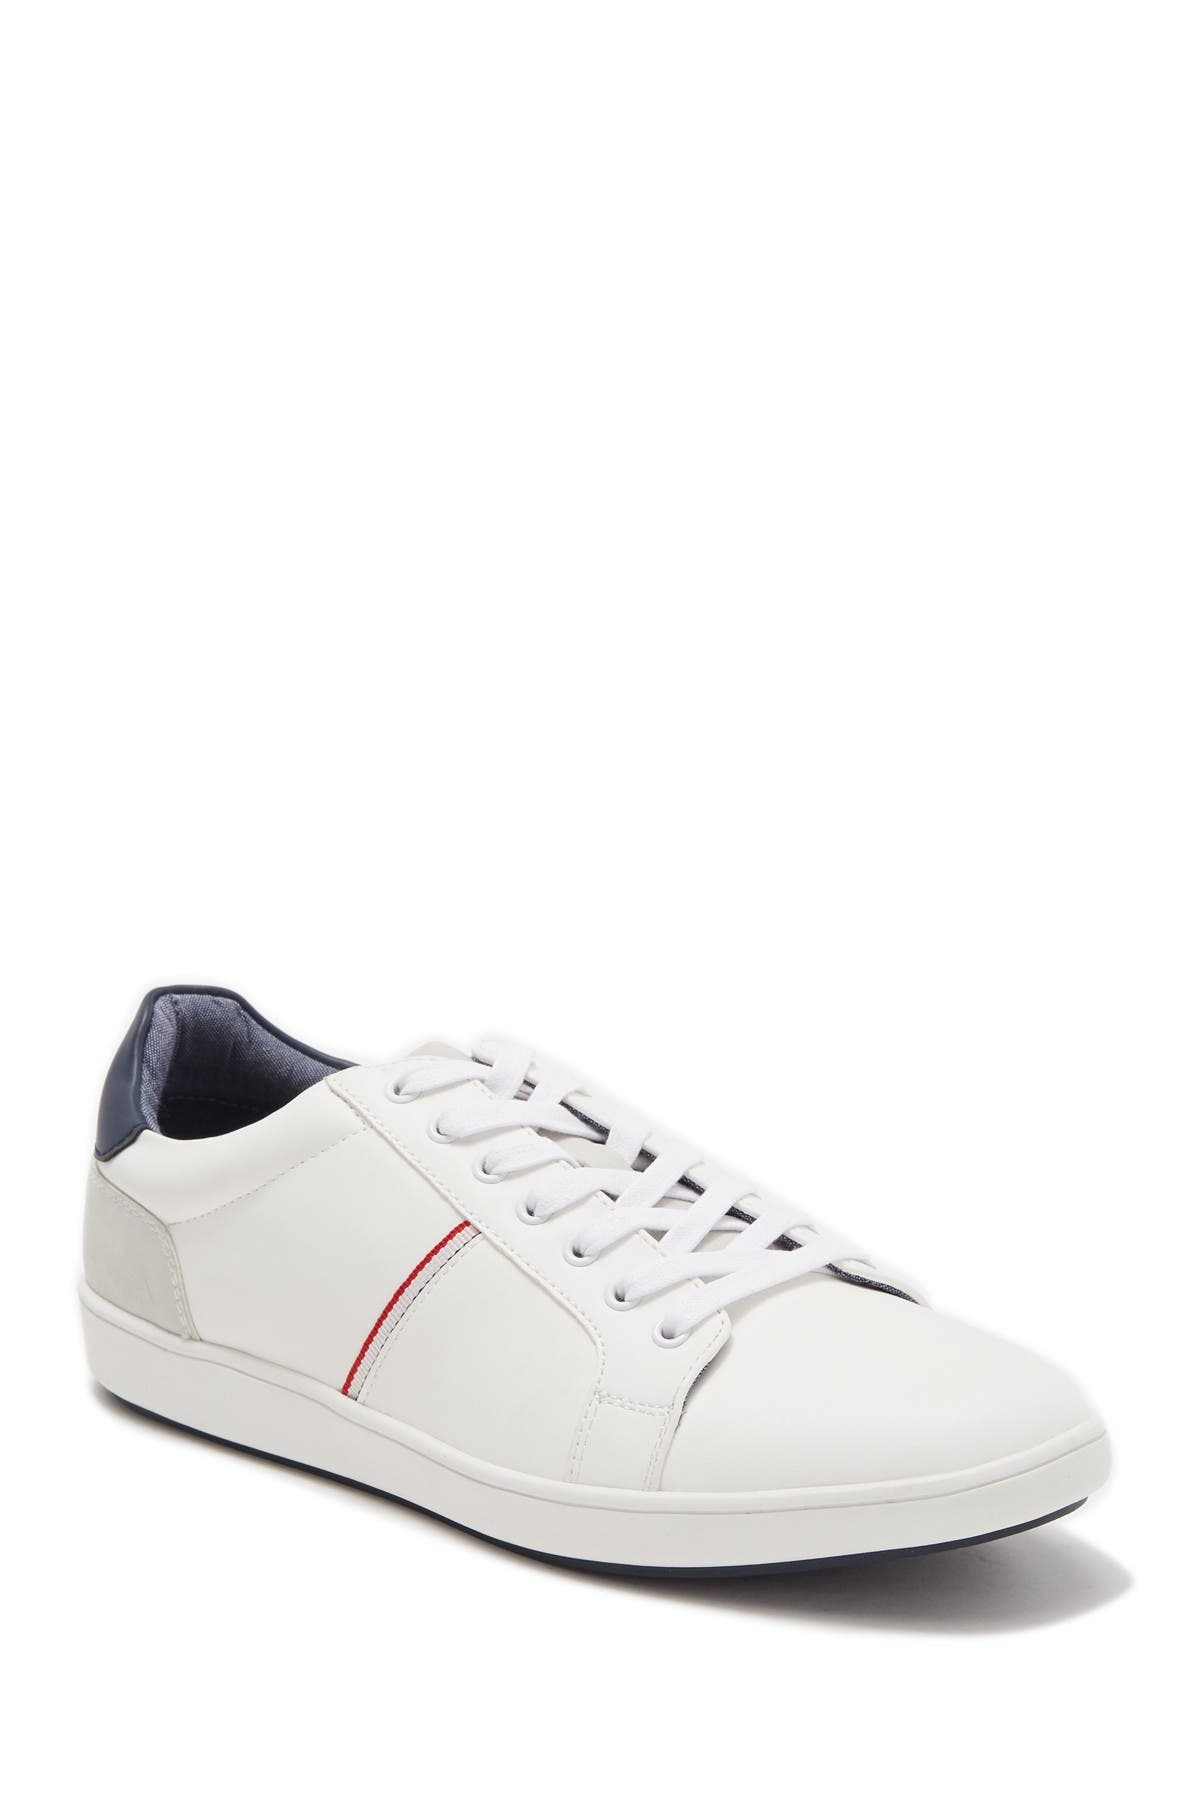 Public Opinion Beckett Sneaker